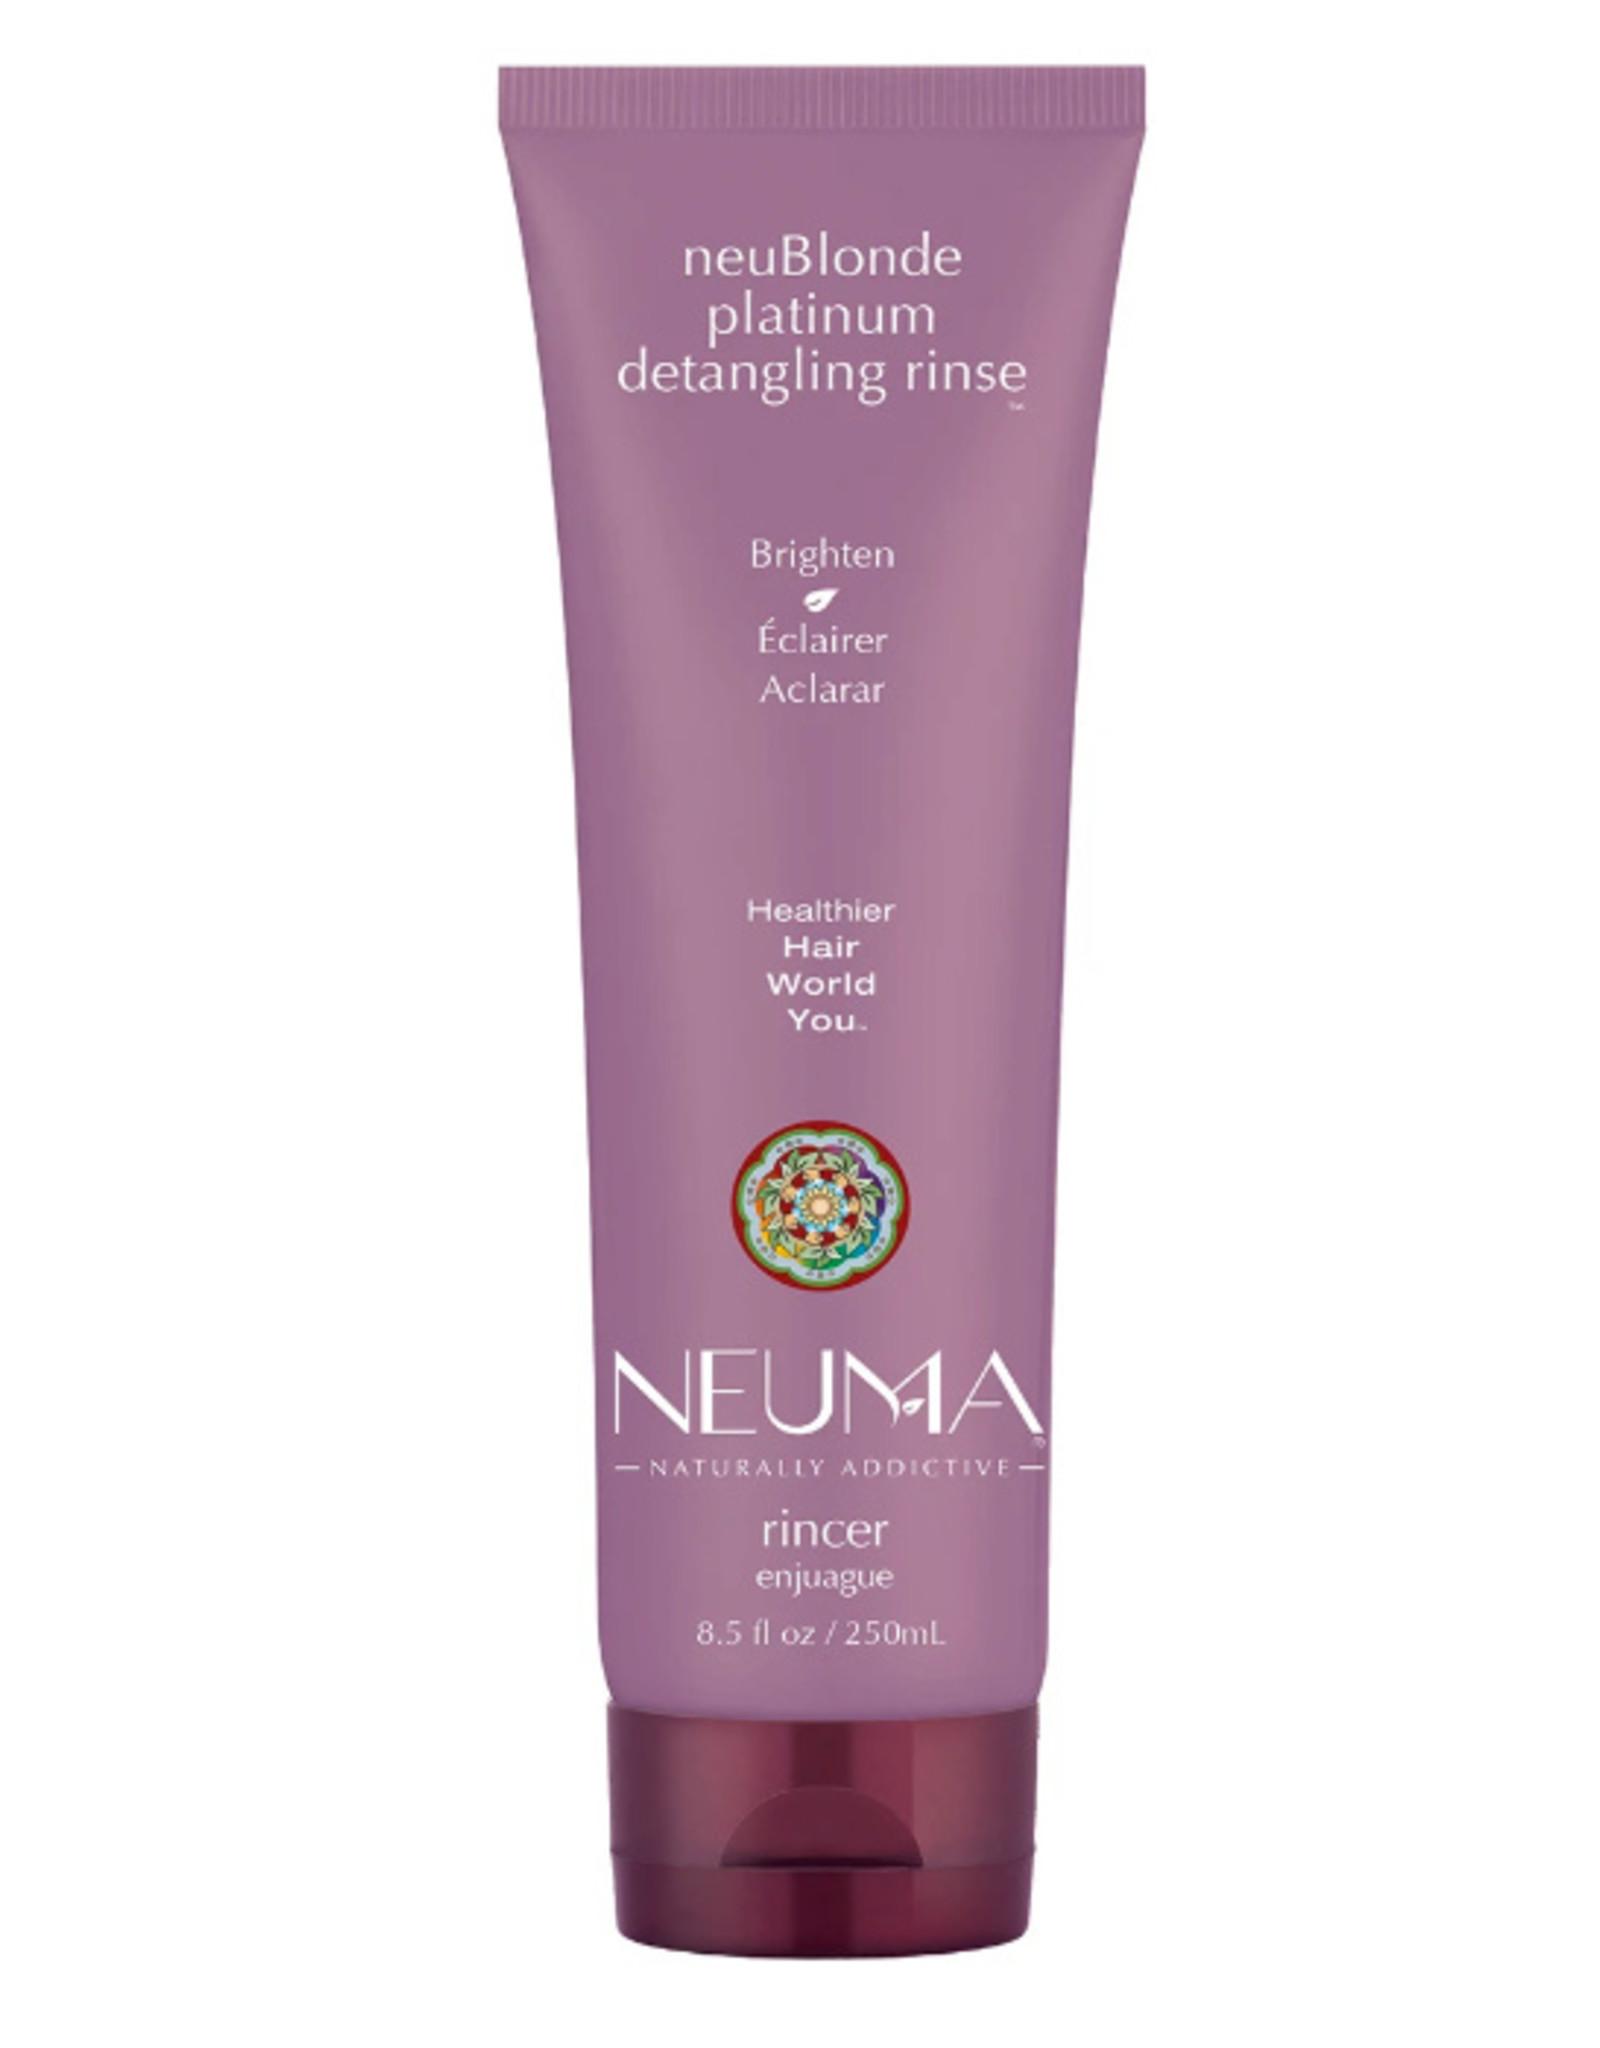 Neuma neuBlonde Platinum Detangling Rinse